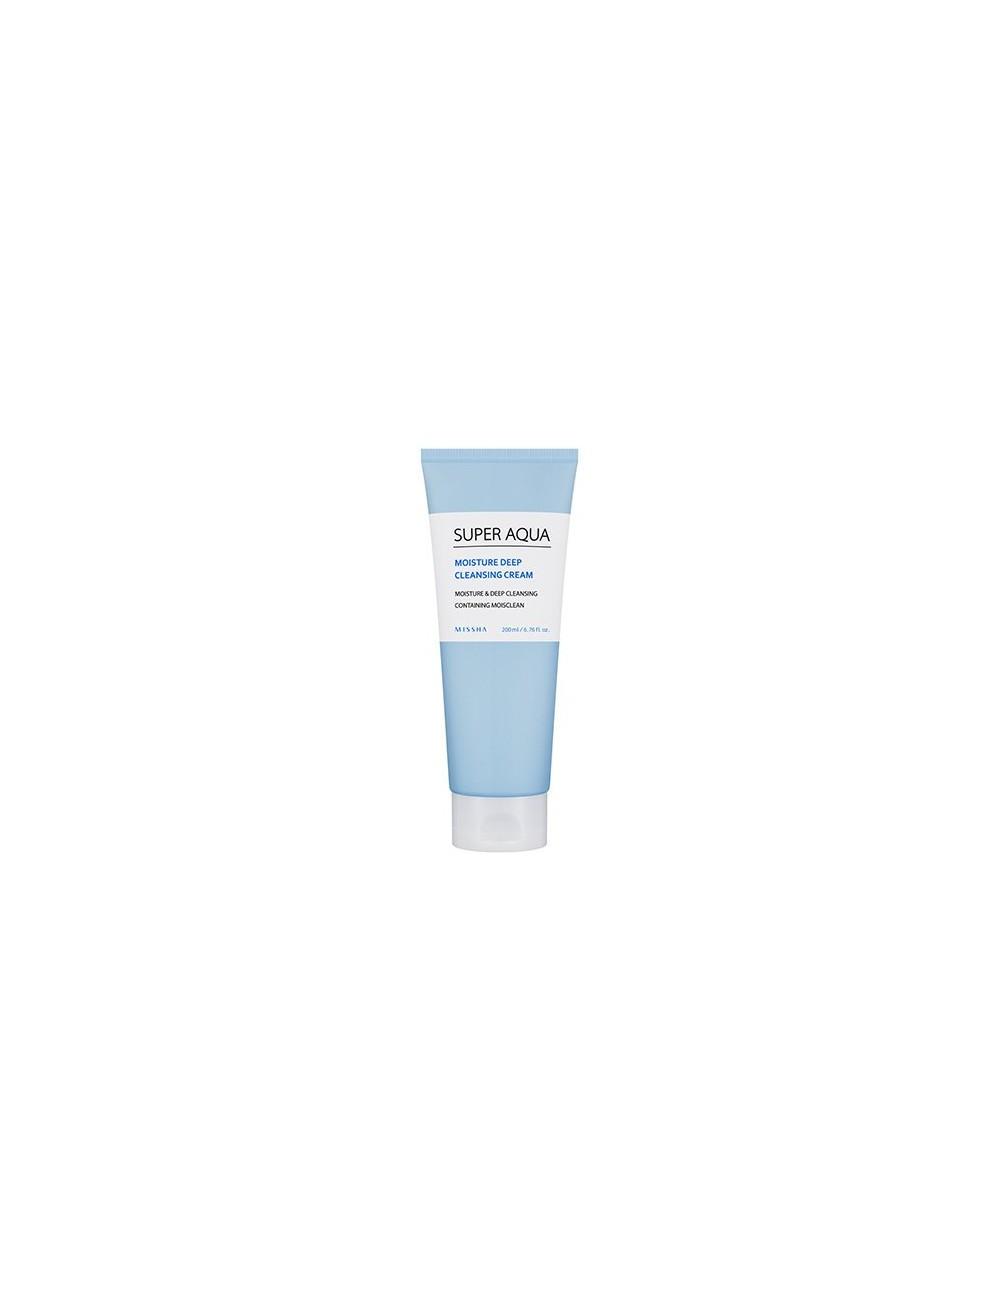 Crema Limpiadora Purificante Missha Super Aqua Moisture Deep Cleansing Cream